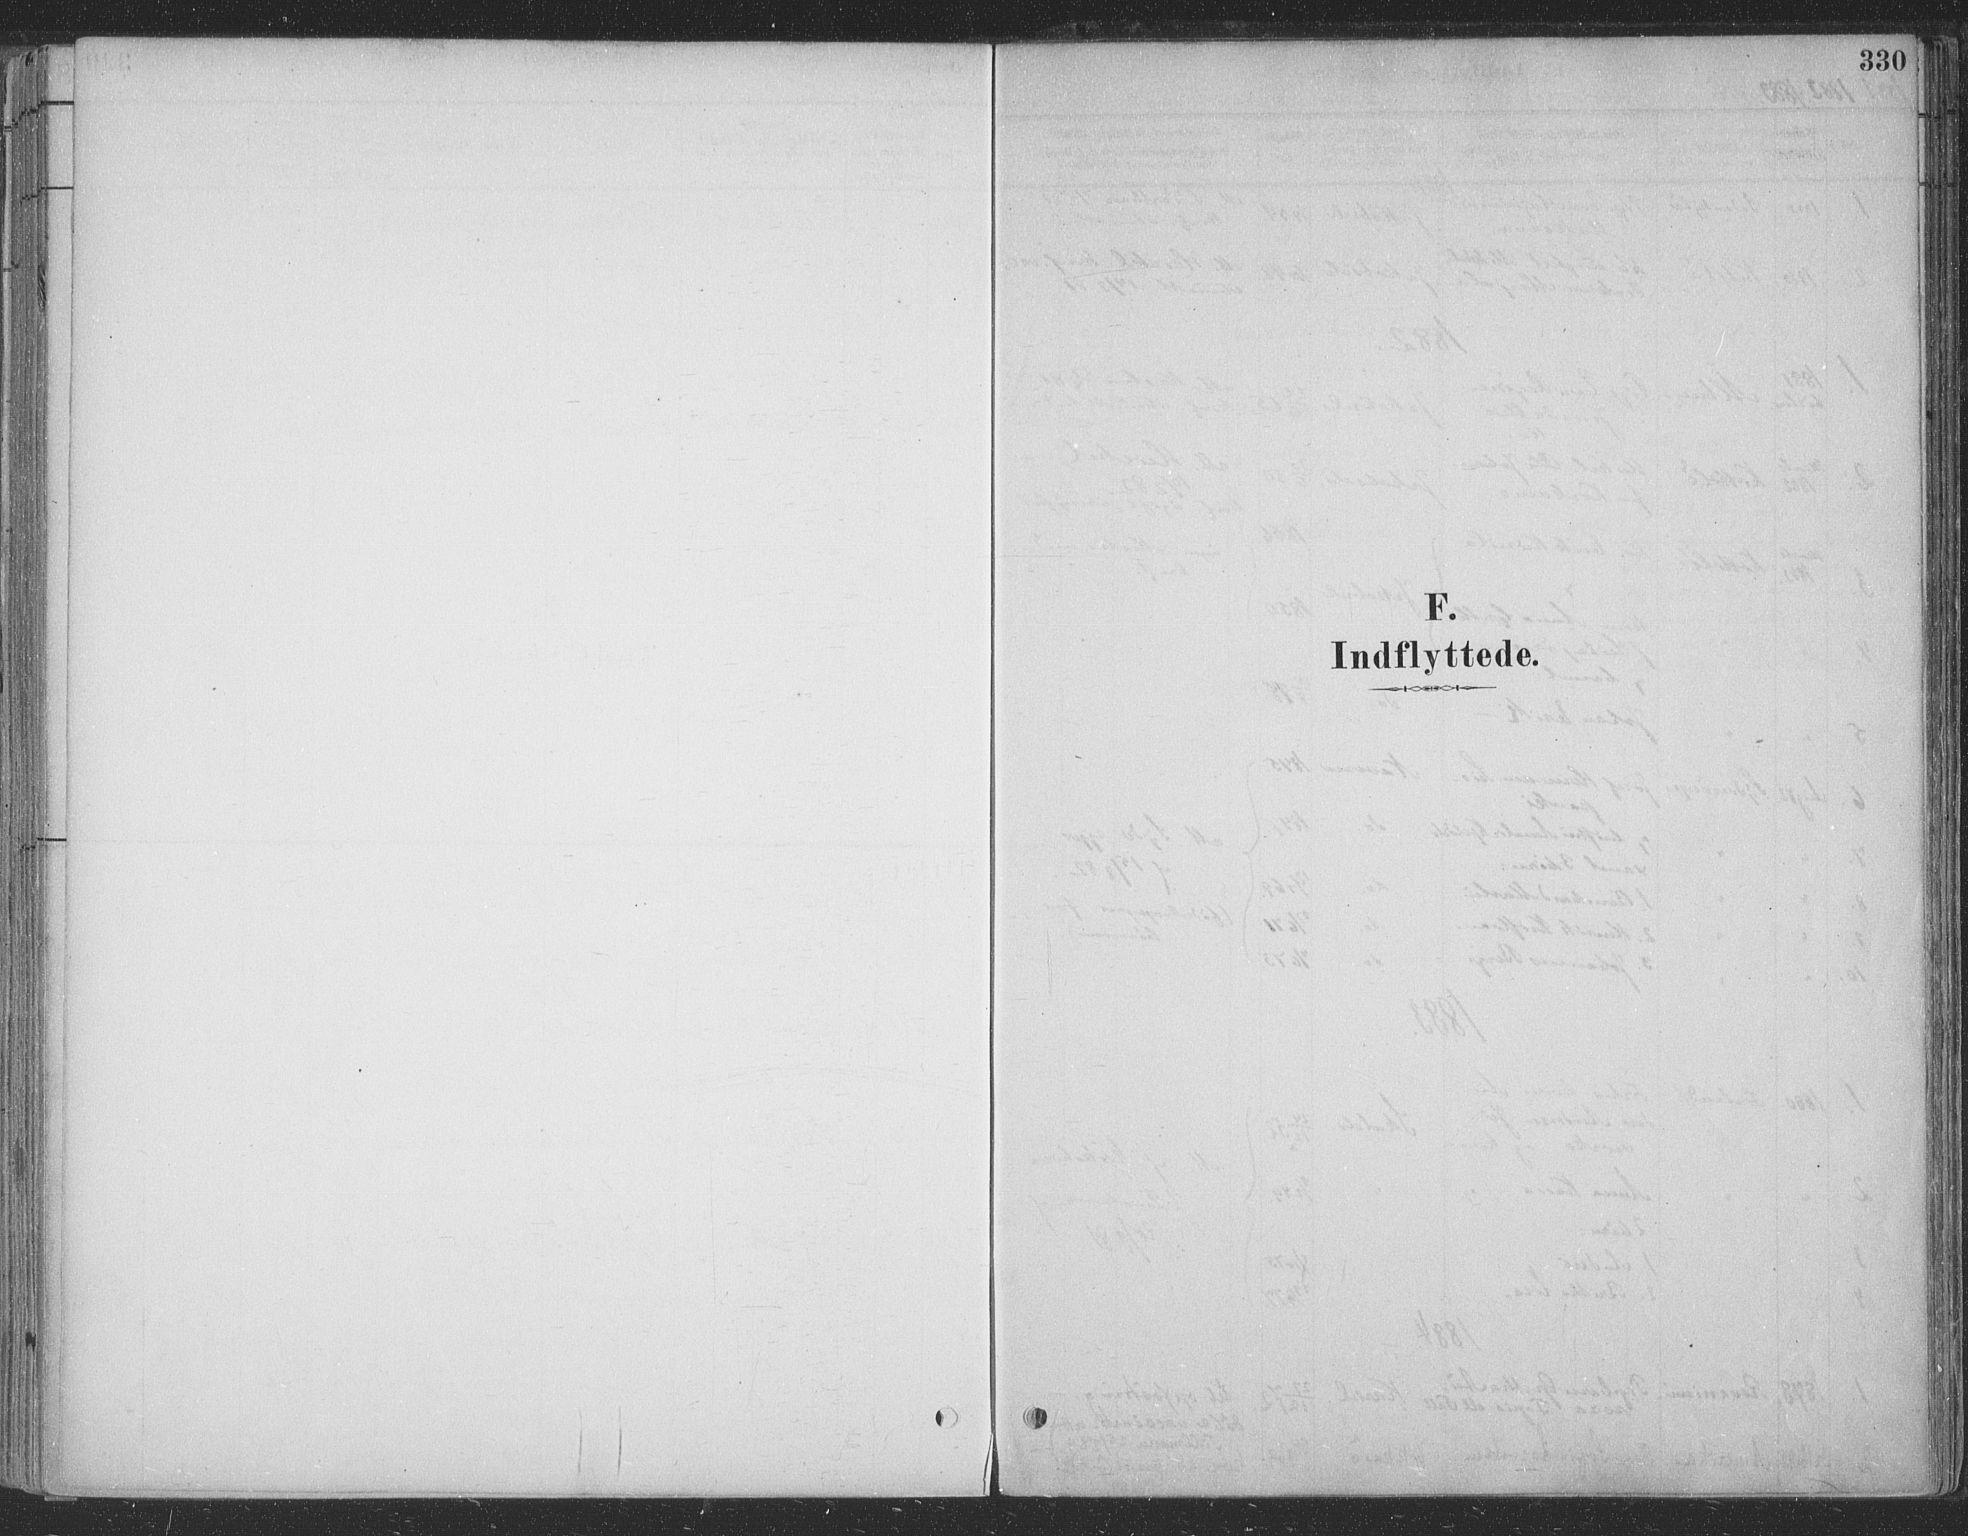 SATØ, Vadsø soknepreskontor, H/Ha/L0009kirke: Parish register (official) no. 9, 1881-1917, p. 330